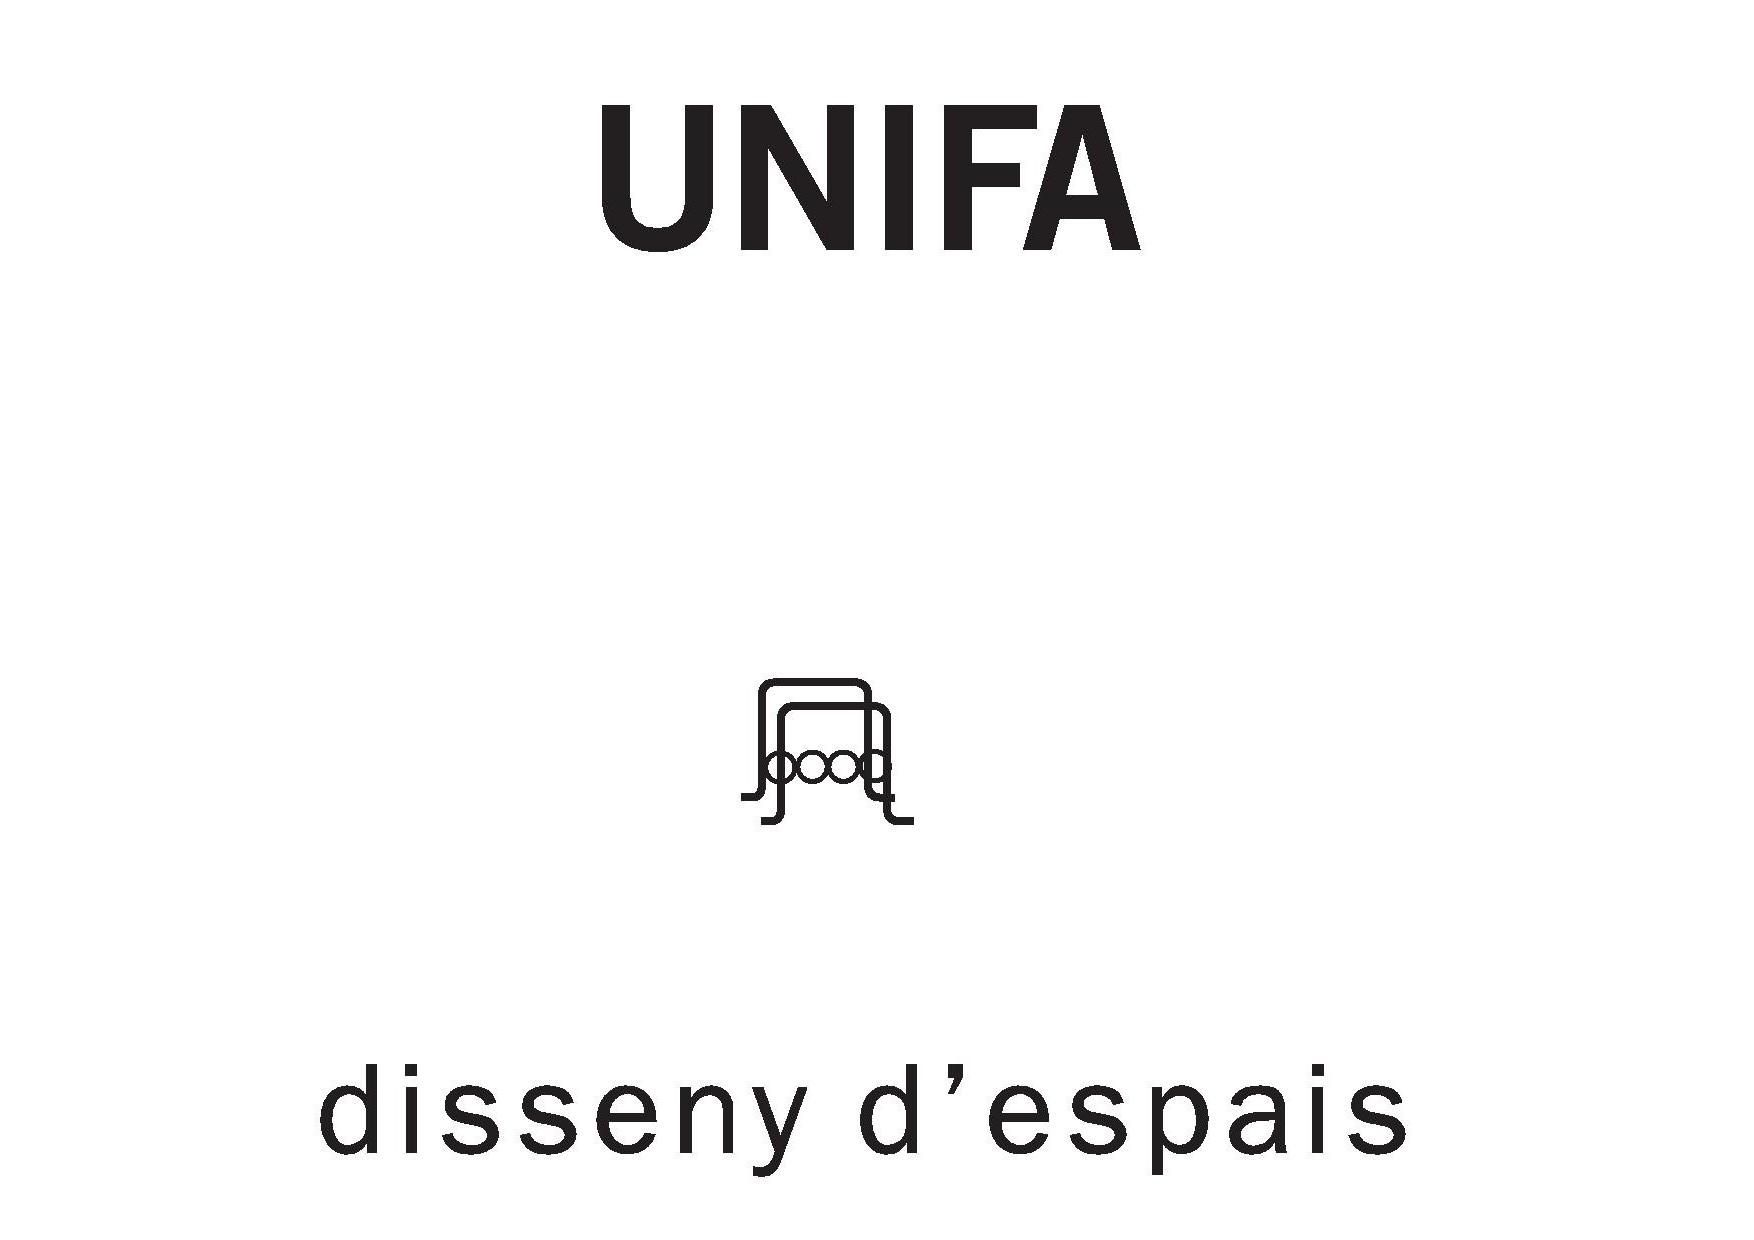 Unifa Disseny D'espais